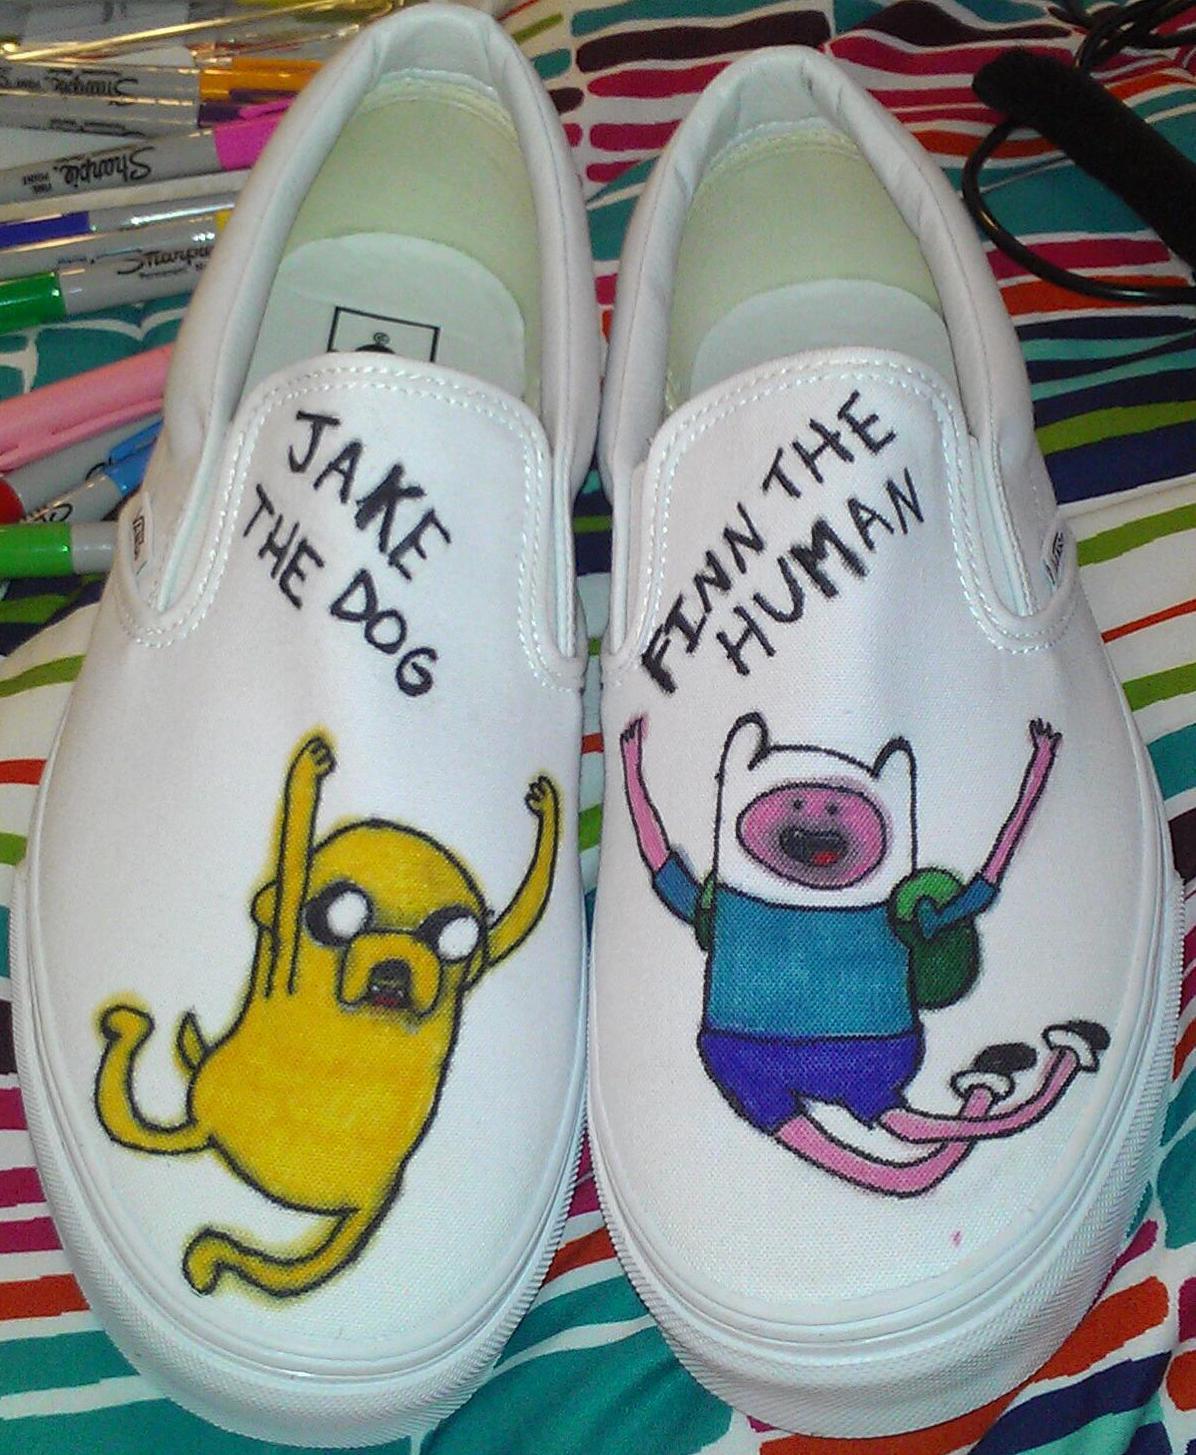 Drawn shoe sharpie Time shoes boyfriend! drawing my